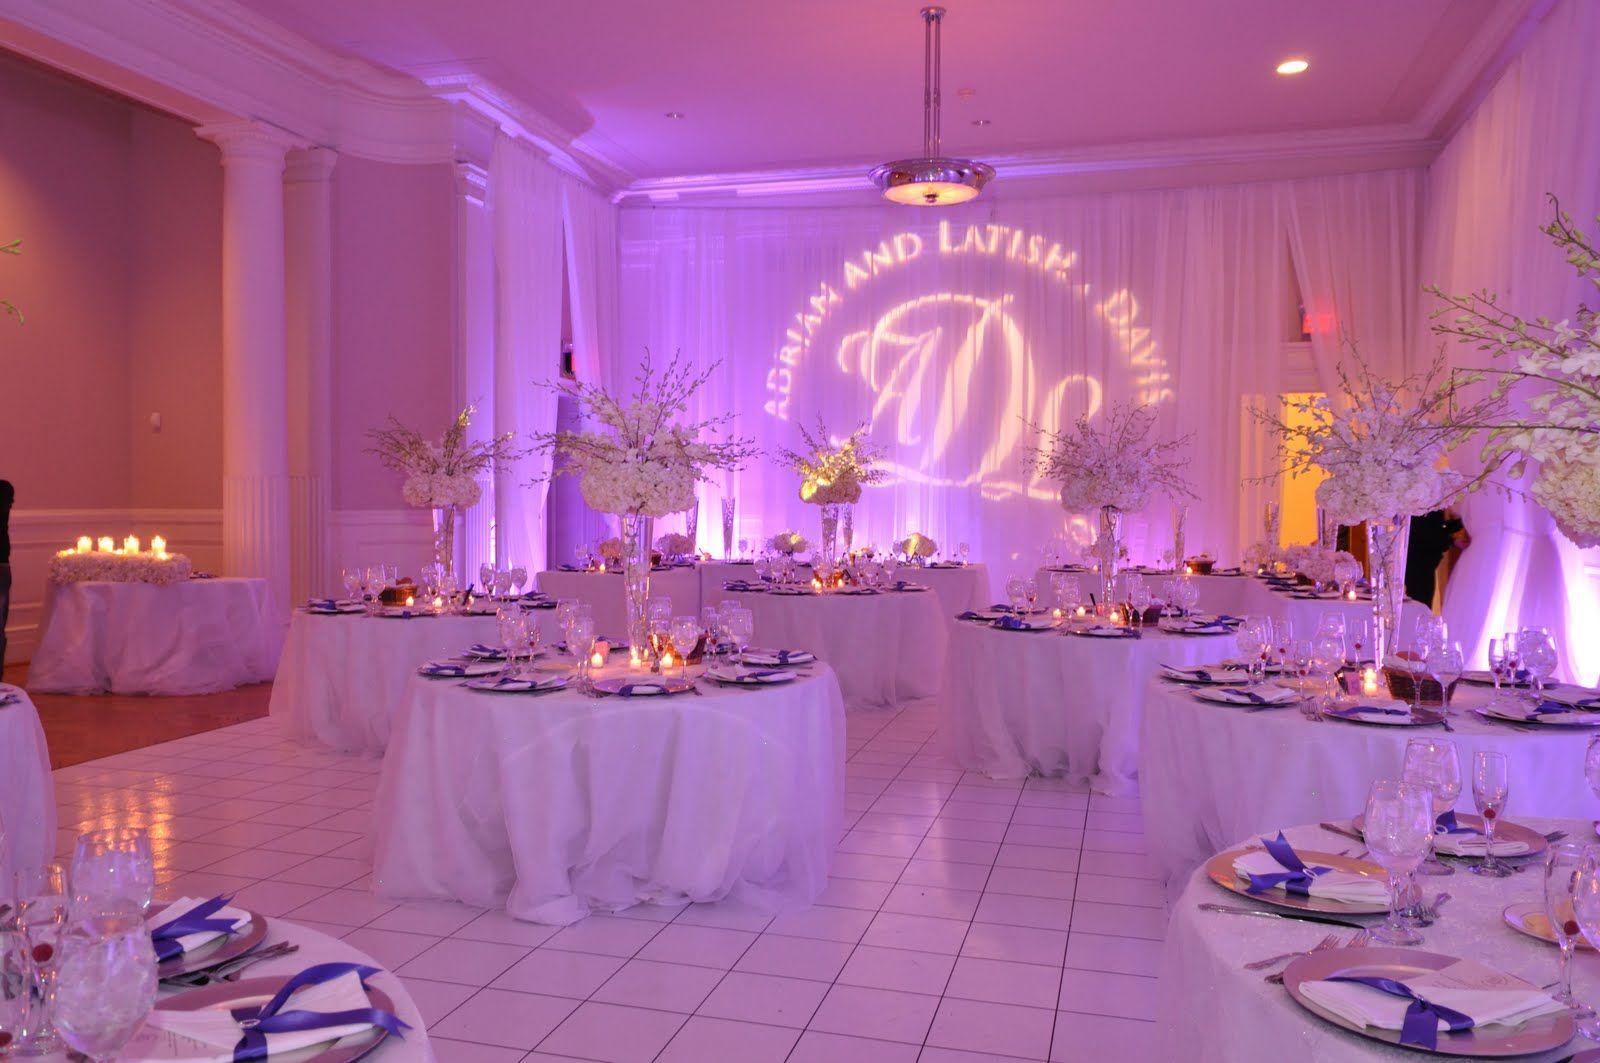 custom wedding gobo pipe and drape | J.R. Wedding | Pinterest ...